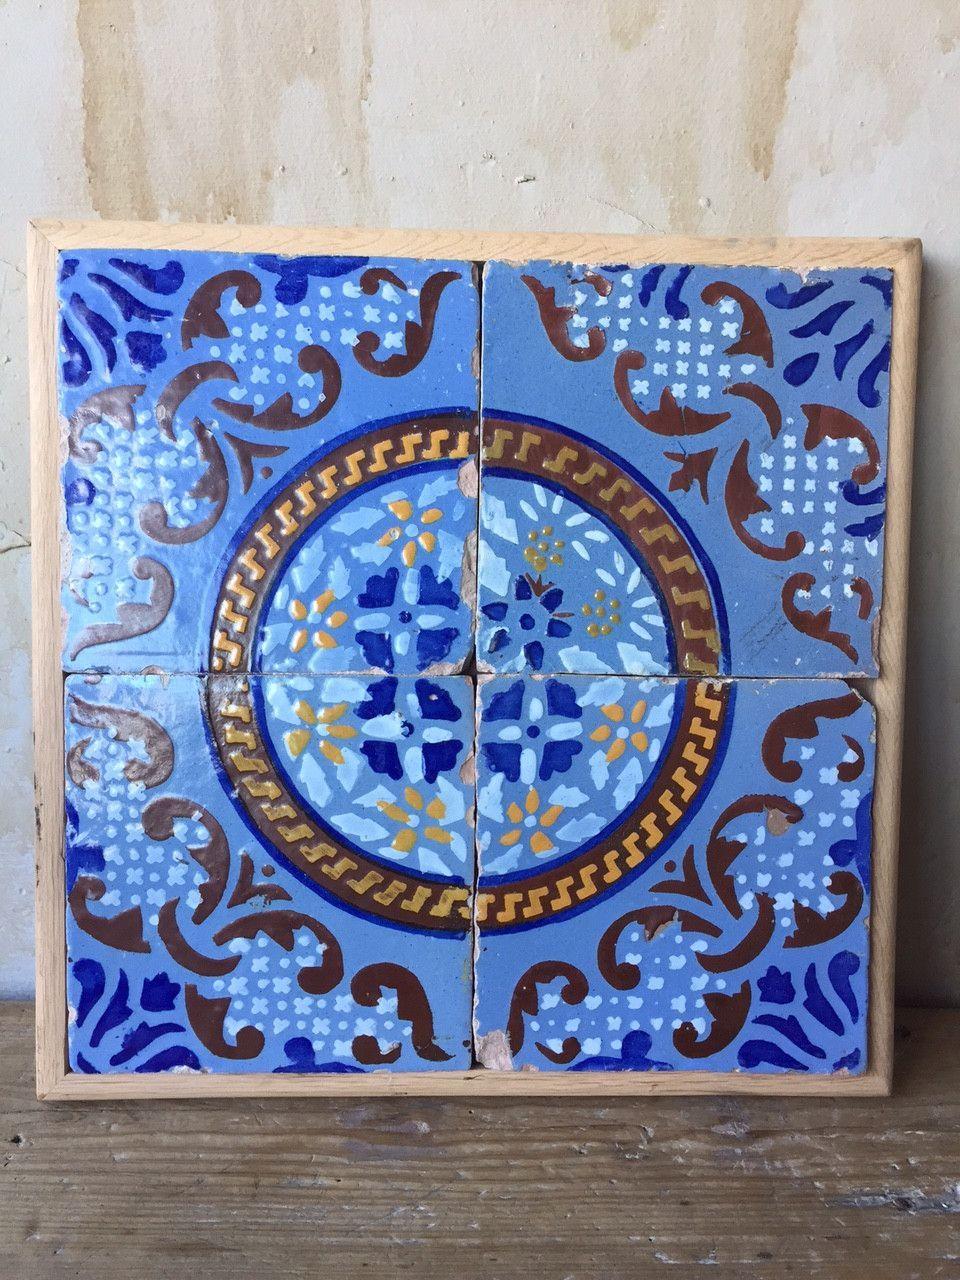 Antique Italian Tiles - 19th Century | Pinterest | Southern italy ...